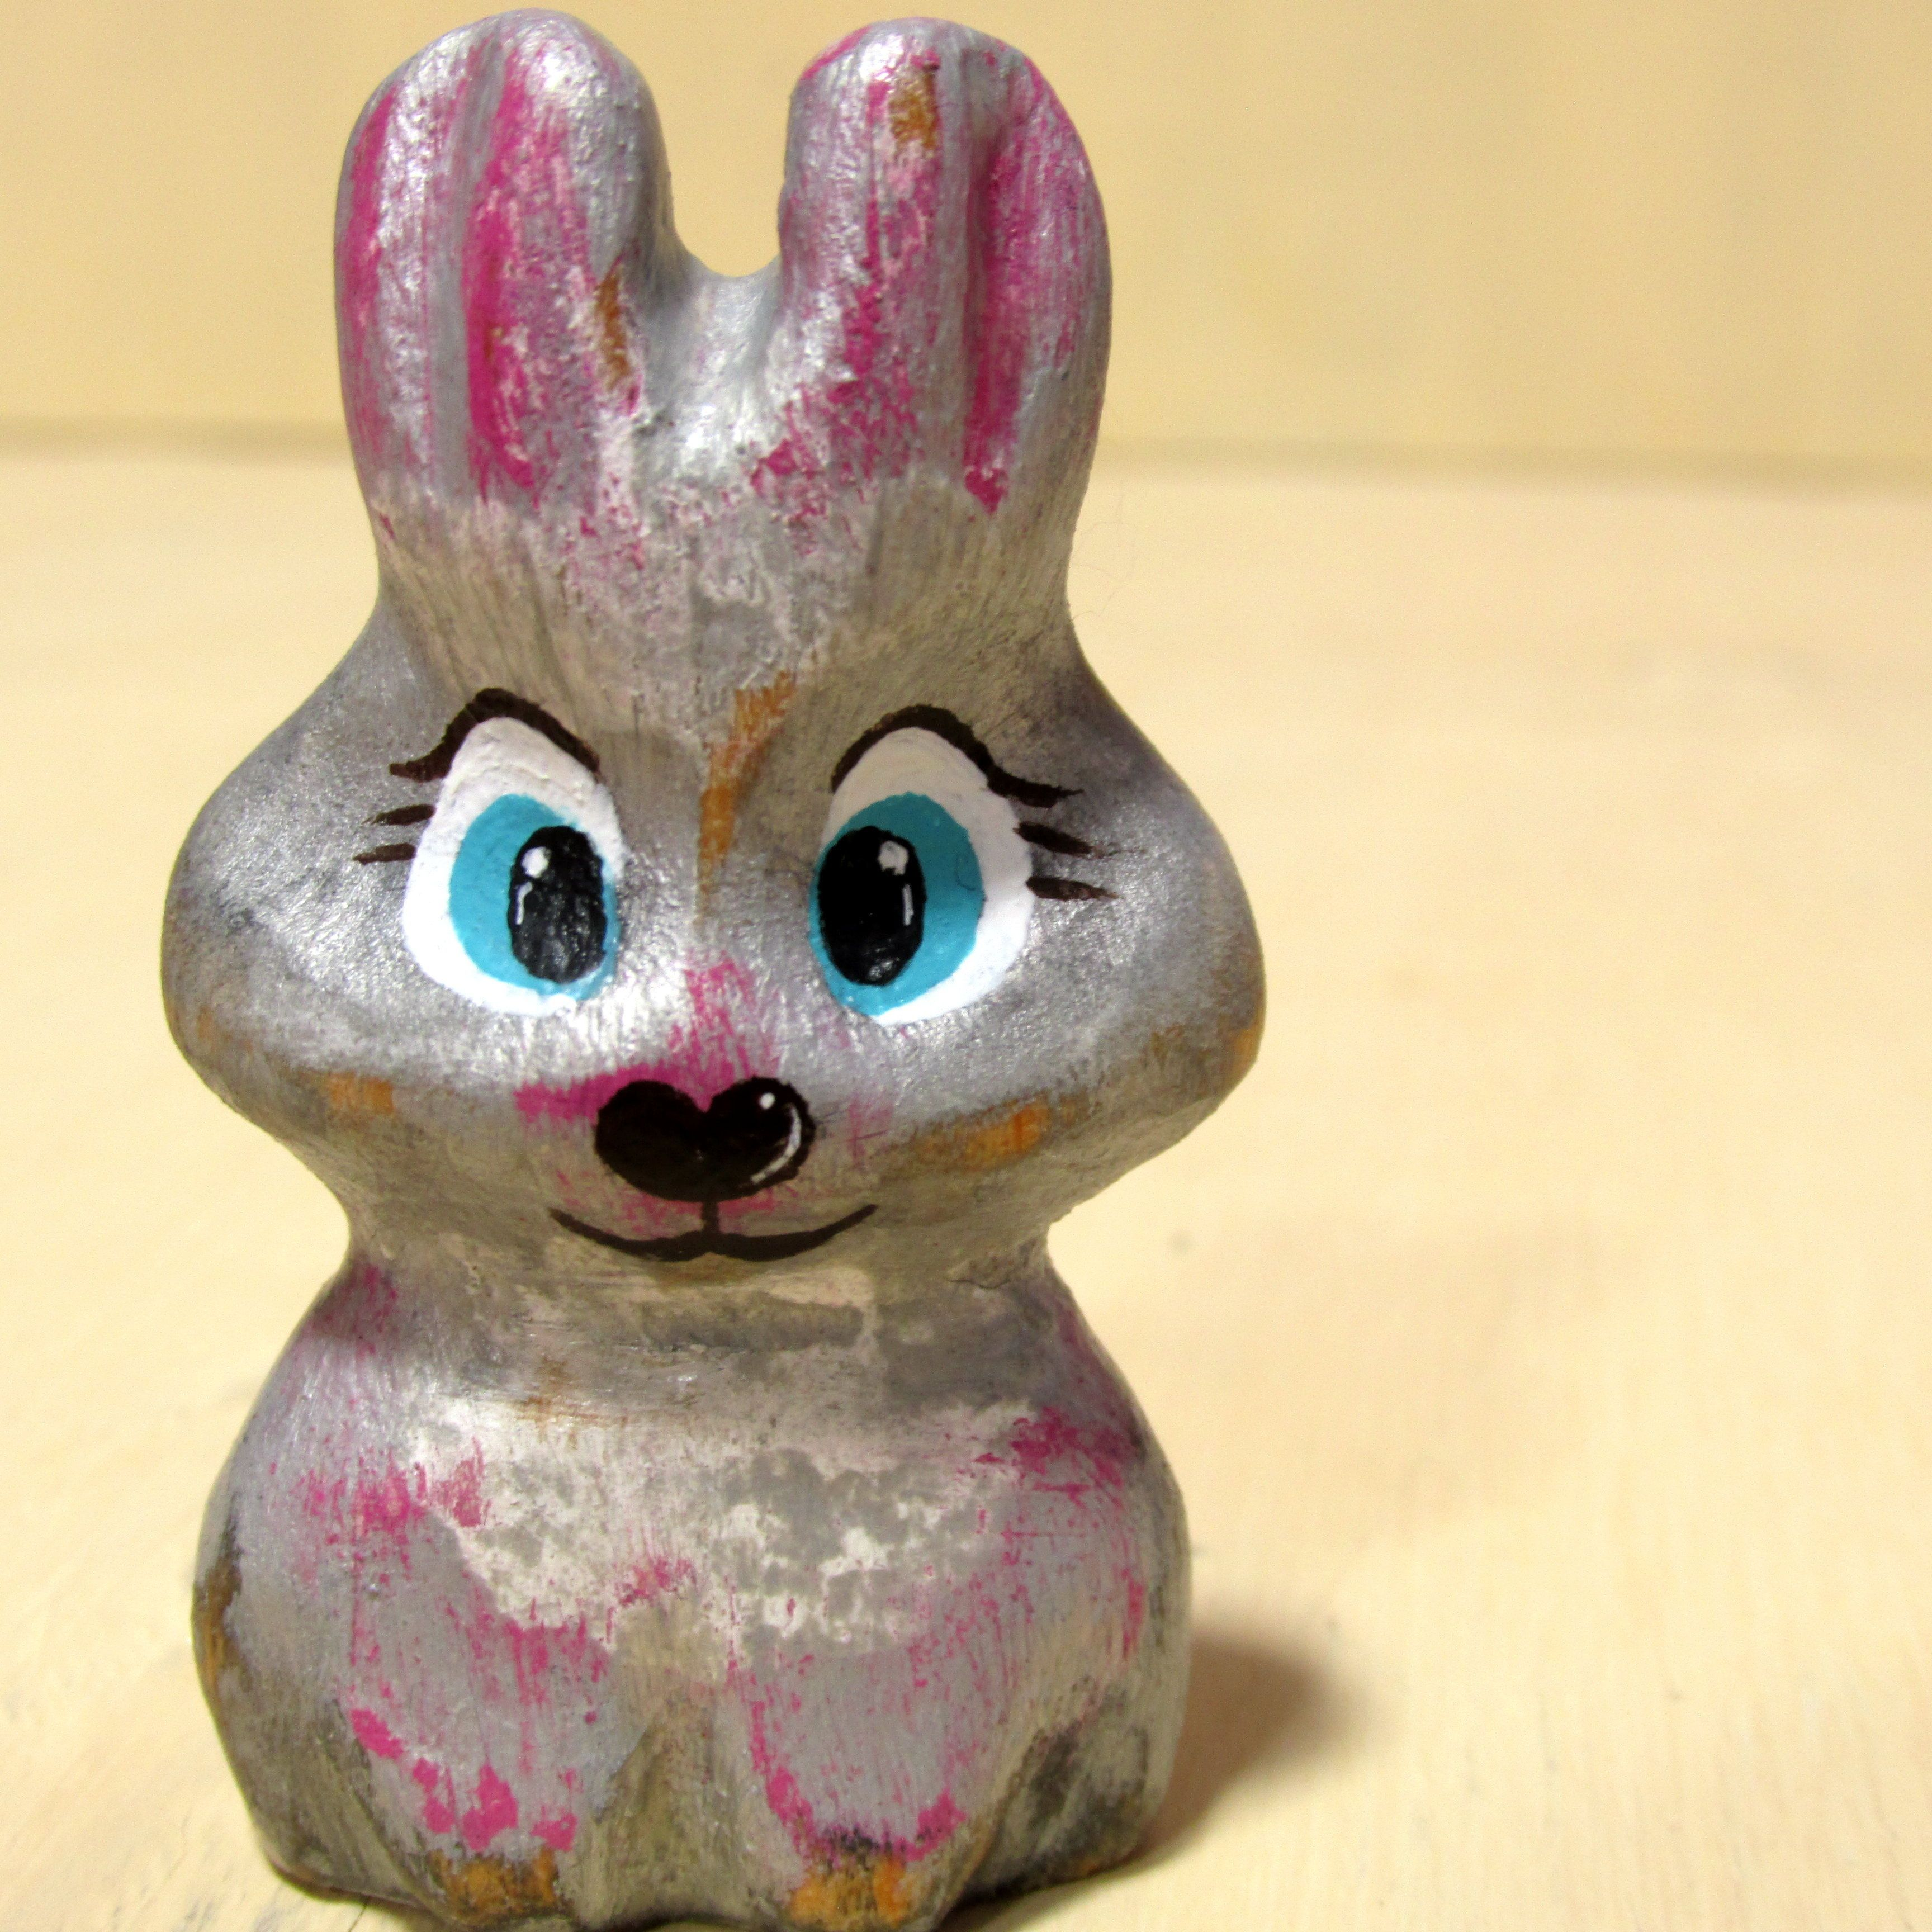 Wooden Rabbit Figure Figurine Easter Bunny Wood Carve Hare Sculpture